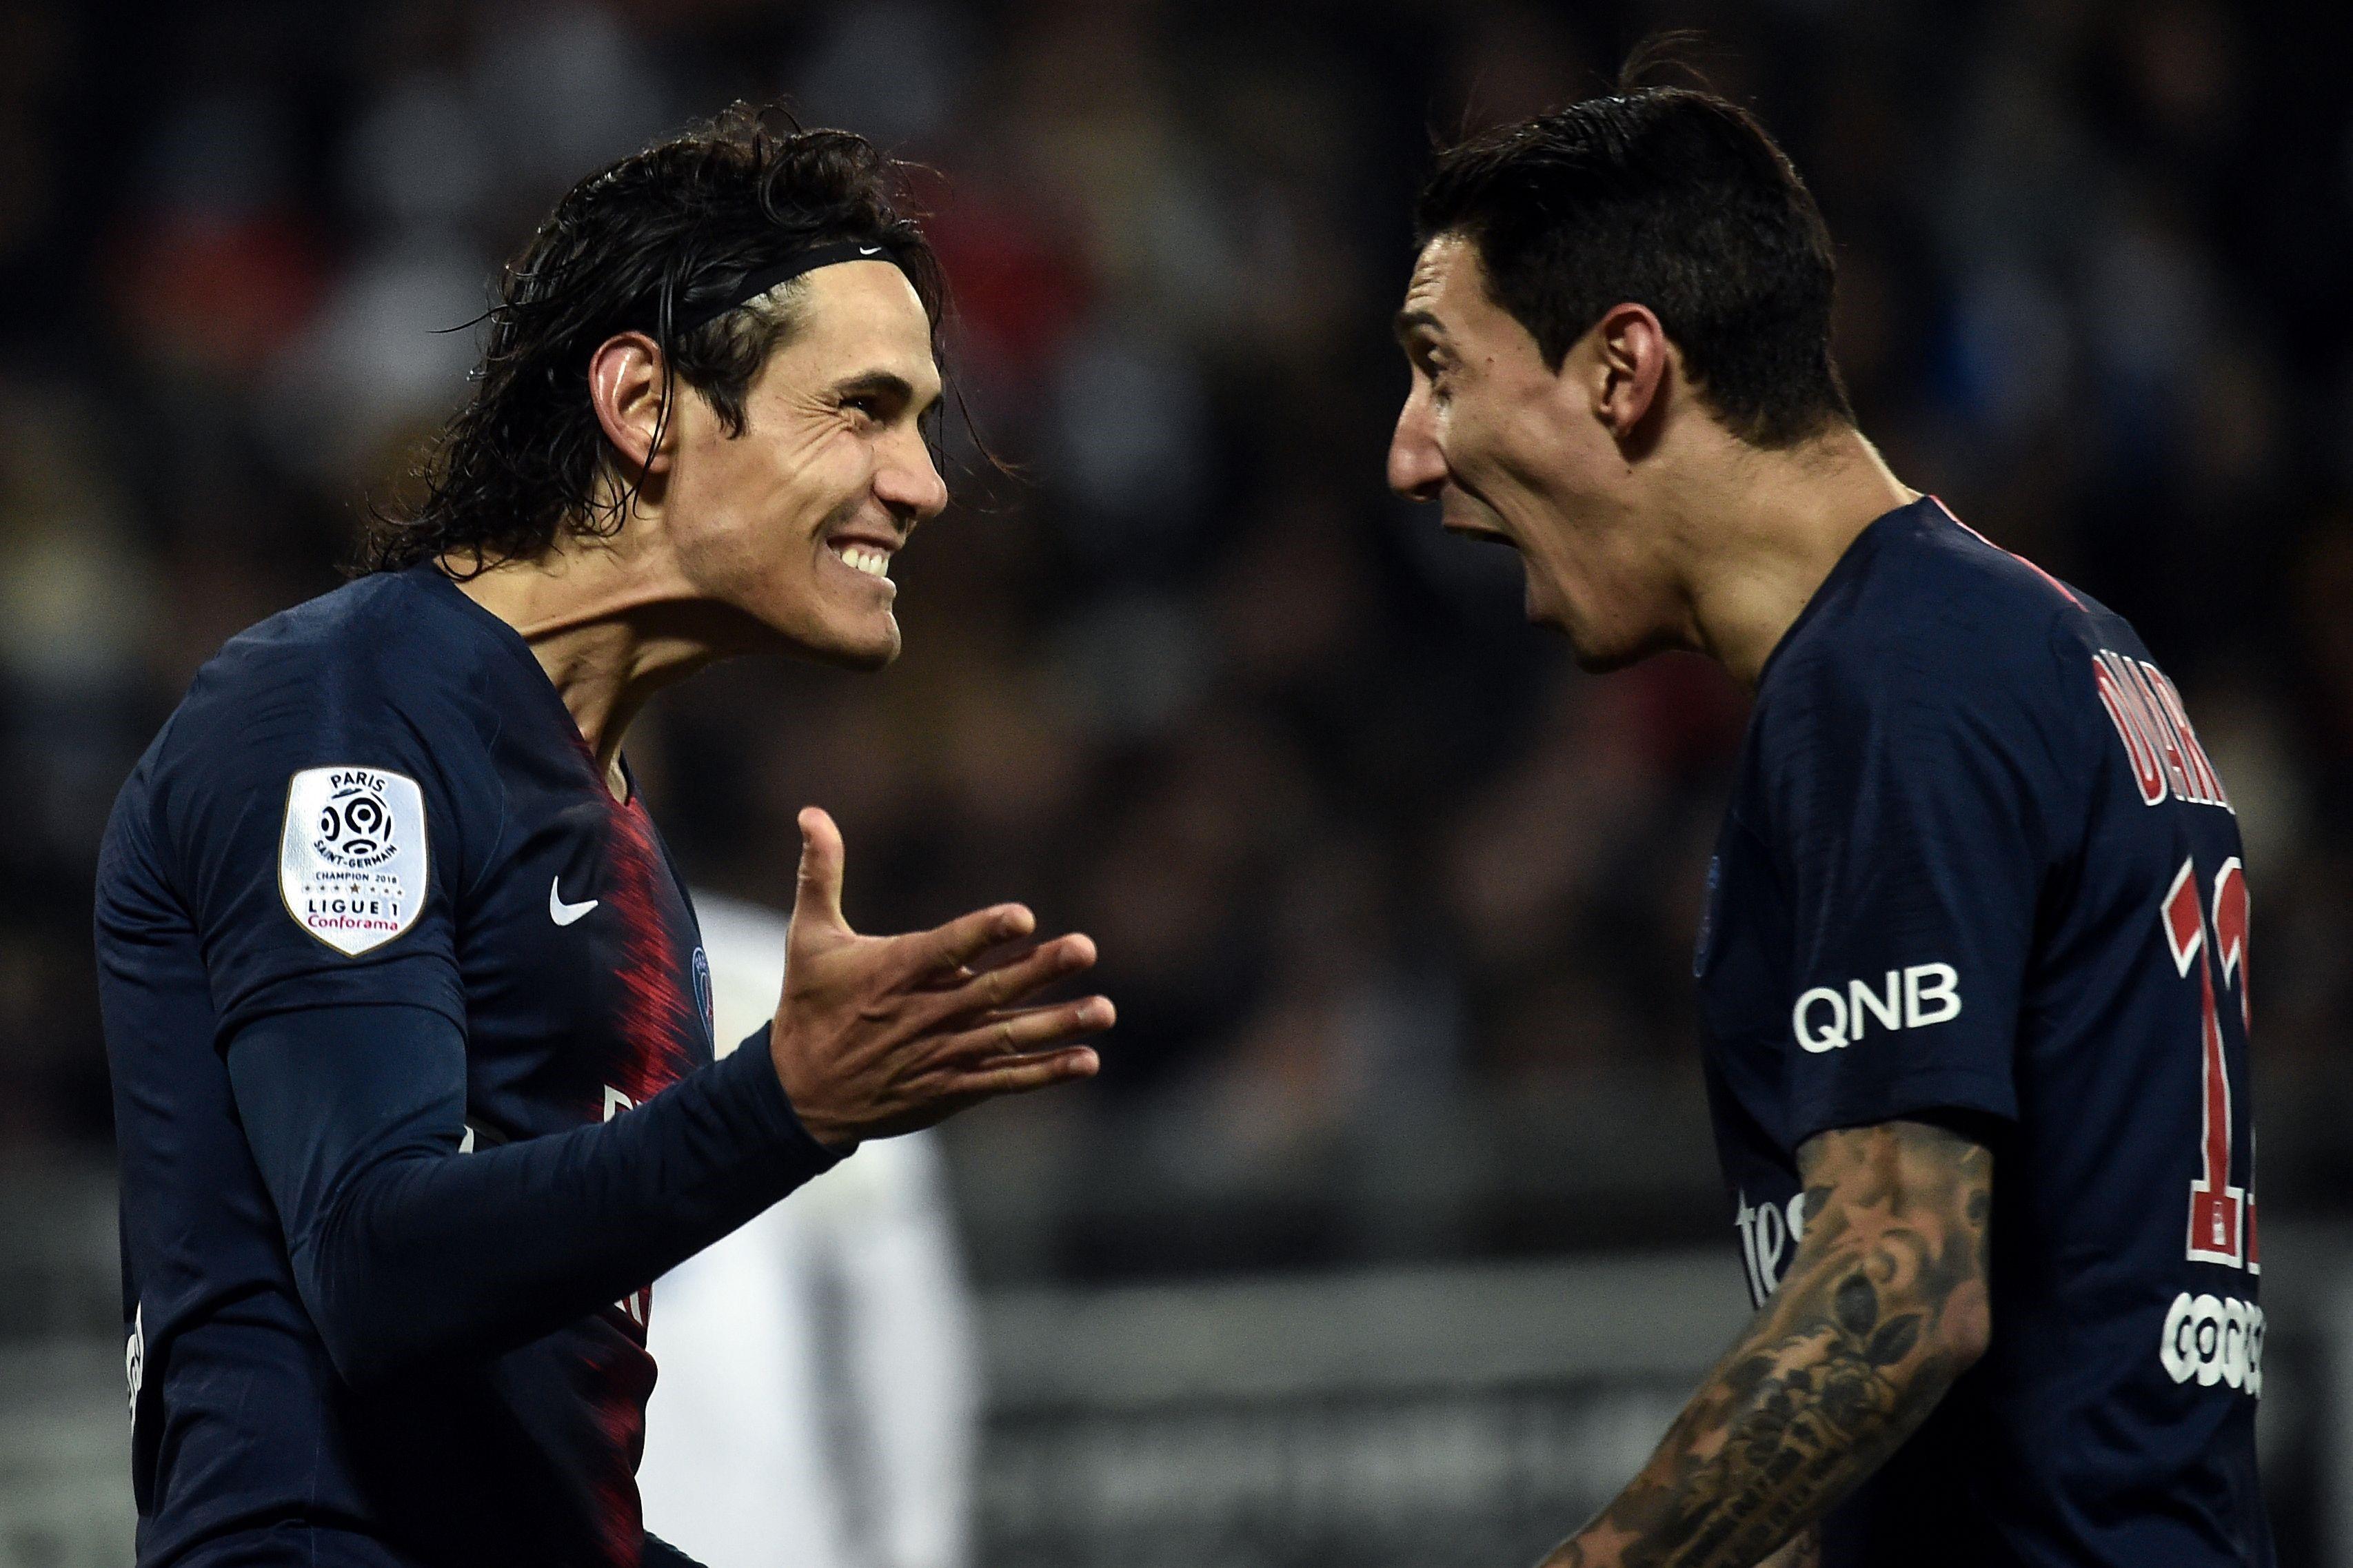 Edinson Cavani et Angel Di Maria lors de Amiens - PSG en Ligue 1 le 12 janvier 2019